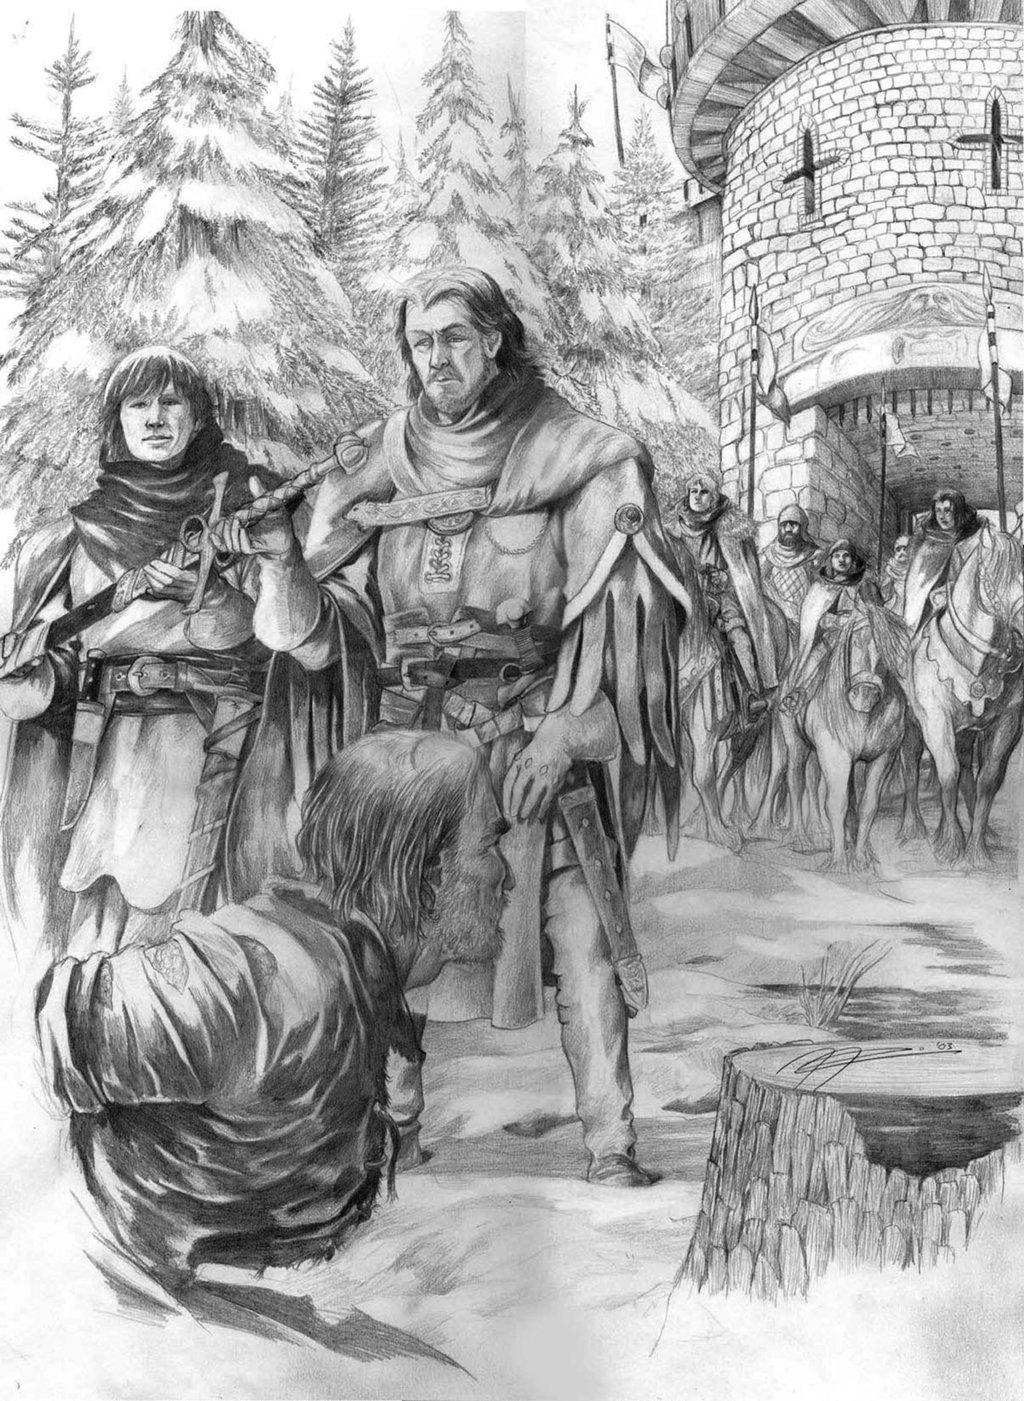 A Game of Thrones - Kapitel 1 - Bran I